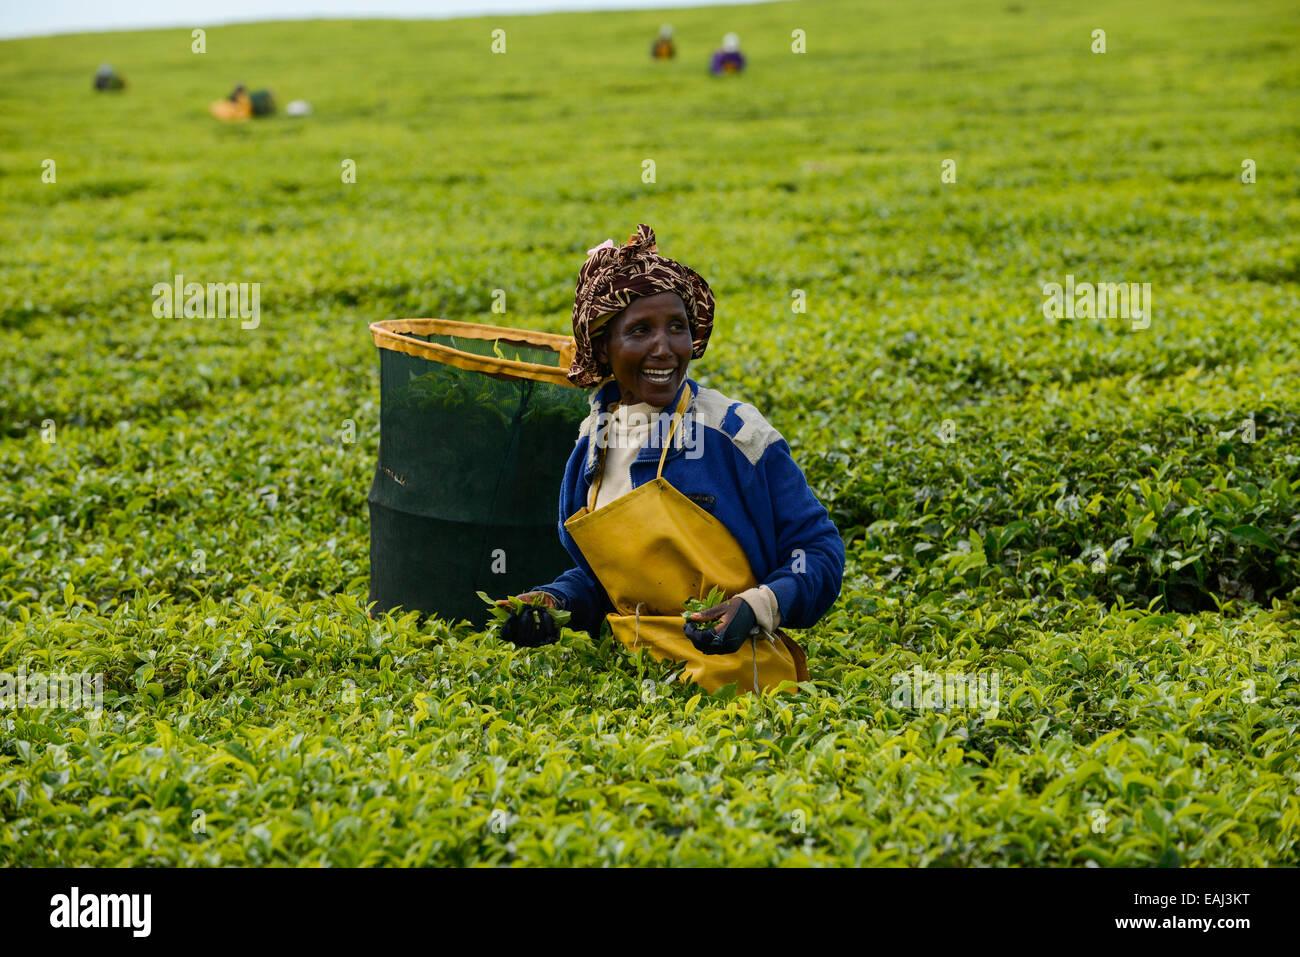 KENYA Kericho, worker pick tea leaves for Lipton tea, tea plantation of Unilever Stock Photo